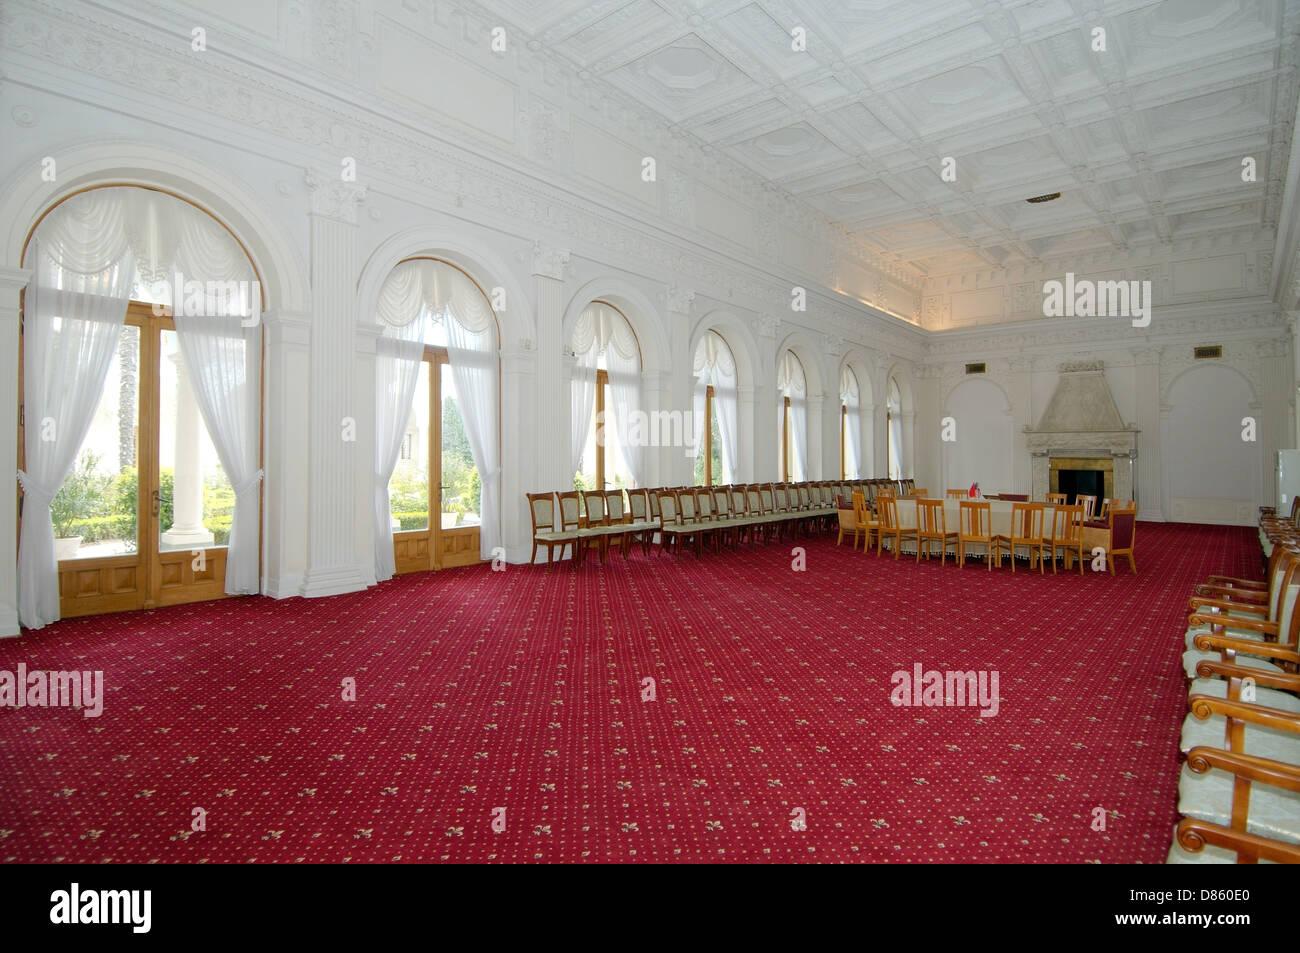 The large conference hall, Grand Livadia Palace, The Greater Yalta, Crimea, Ukraine, Eastern Europe - Stock Image